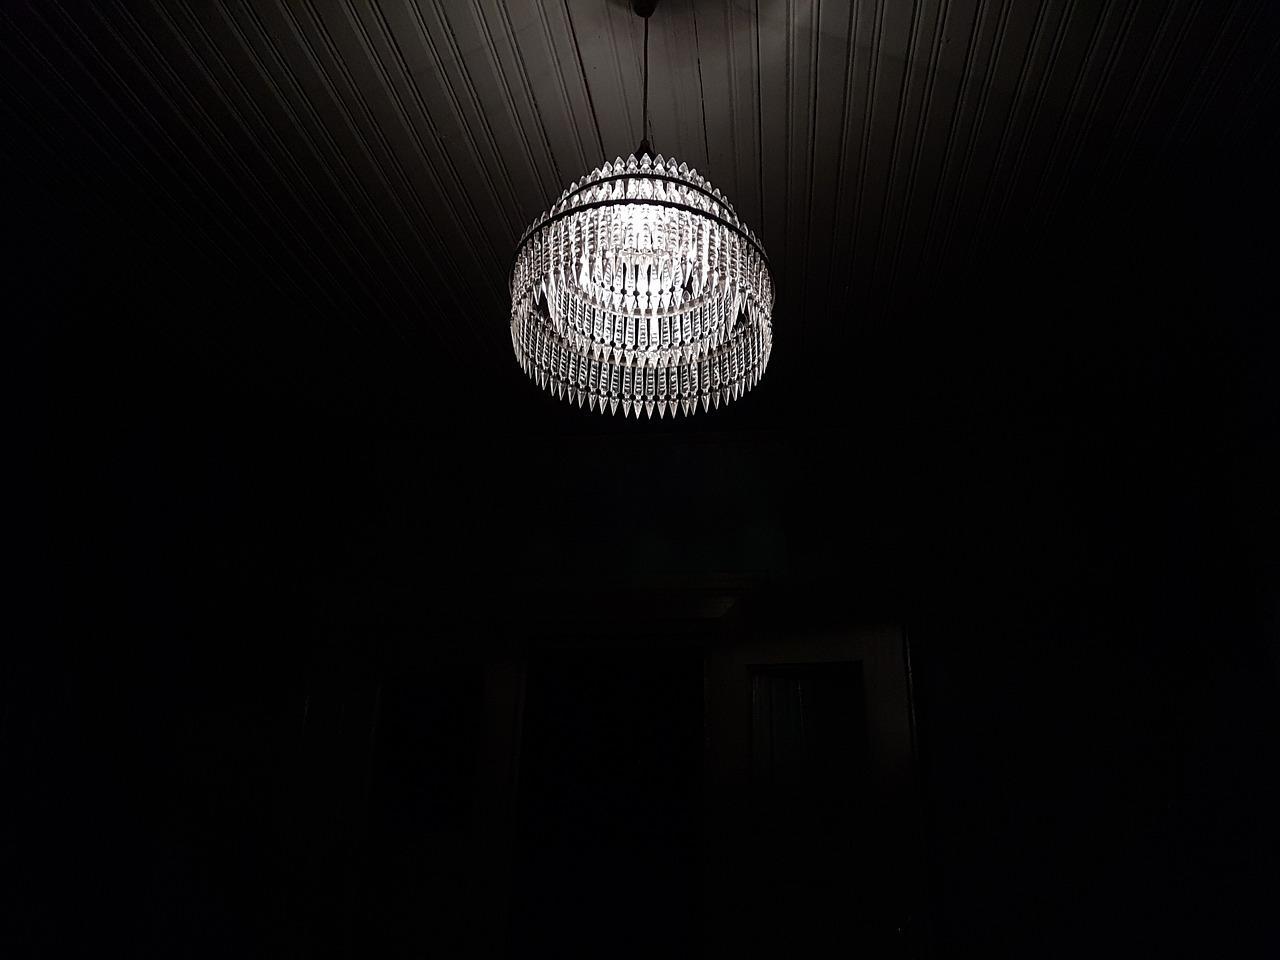 Ekskluzywne lampy Vistosi - nowa kolekcja